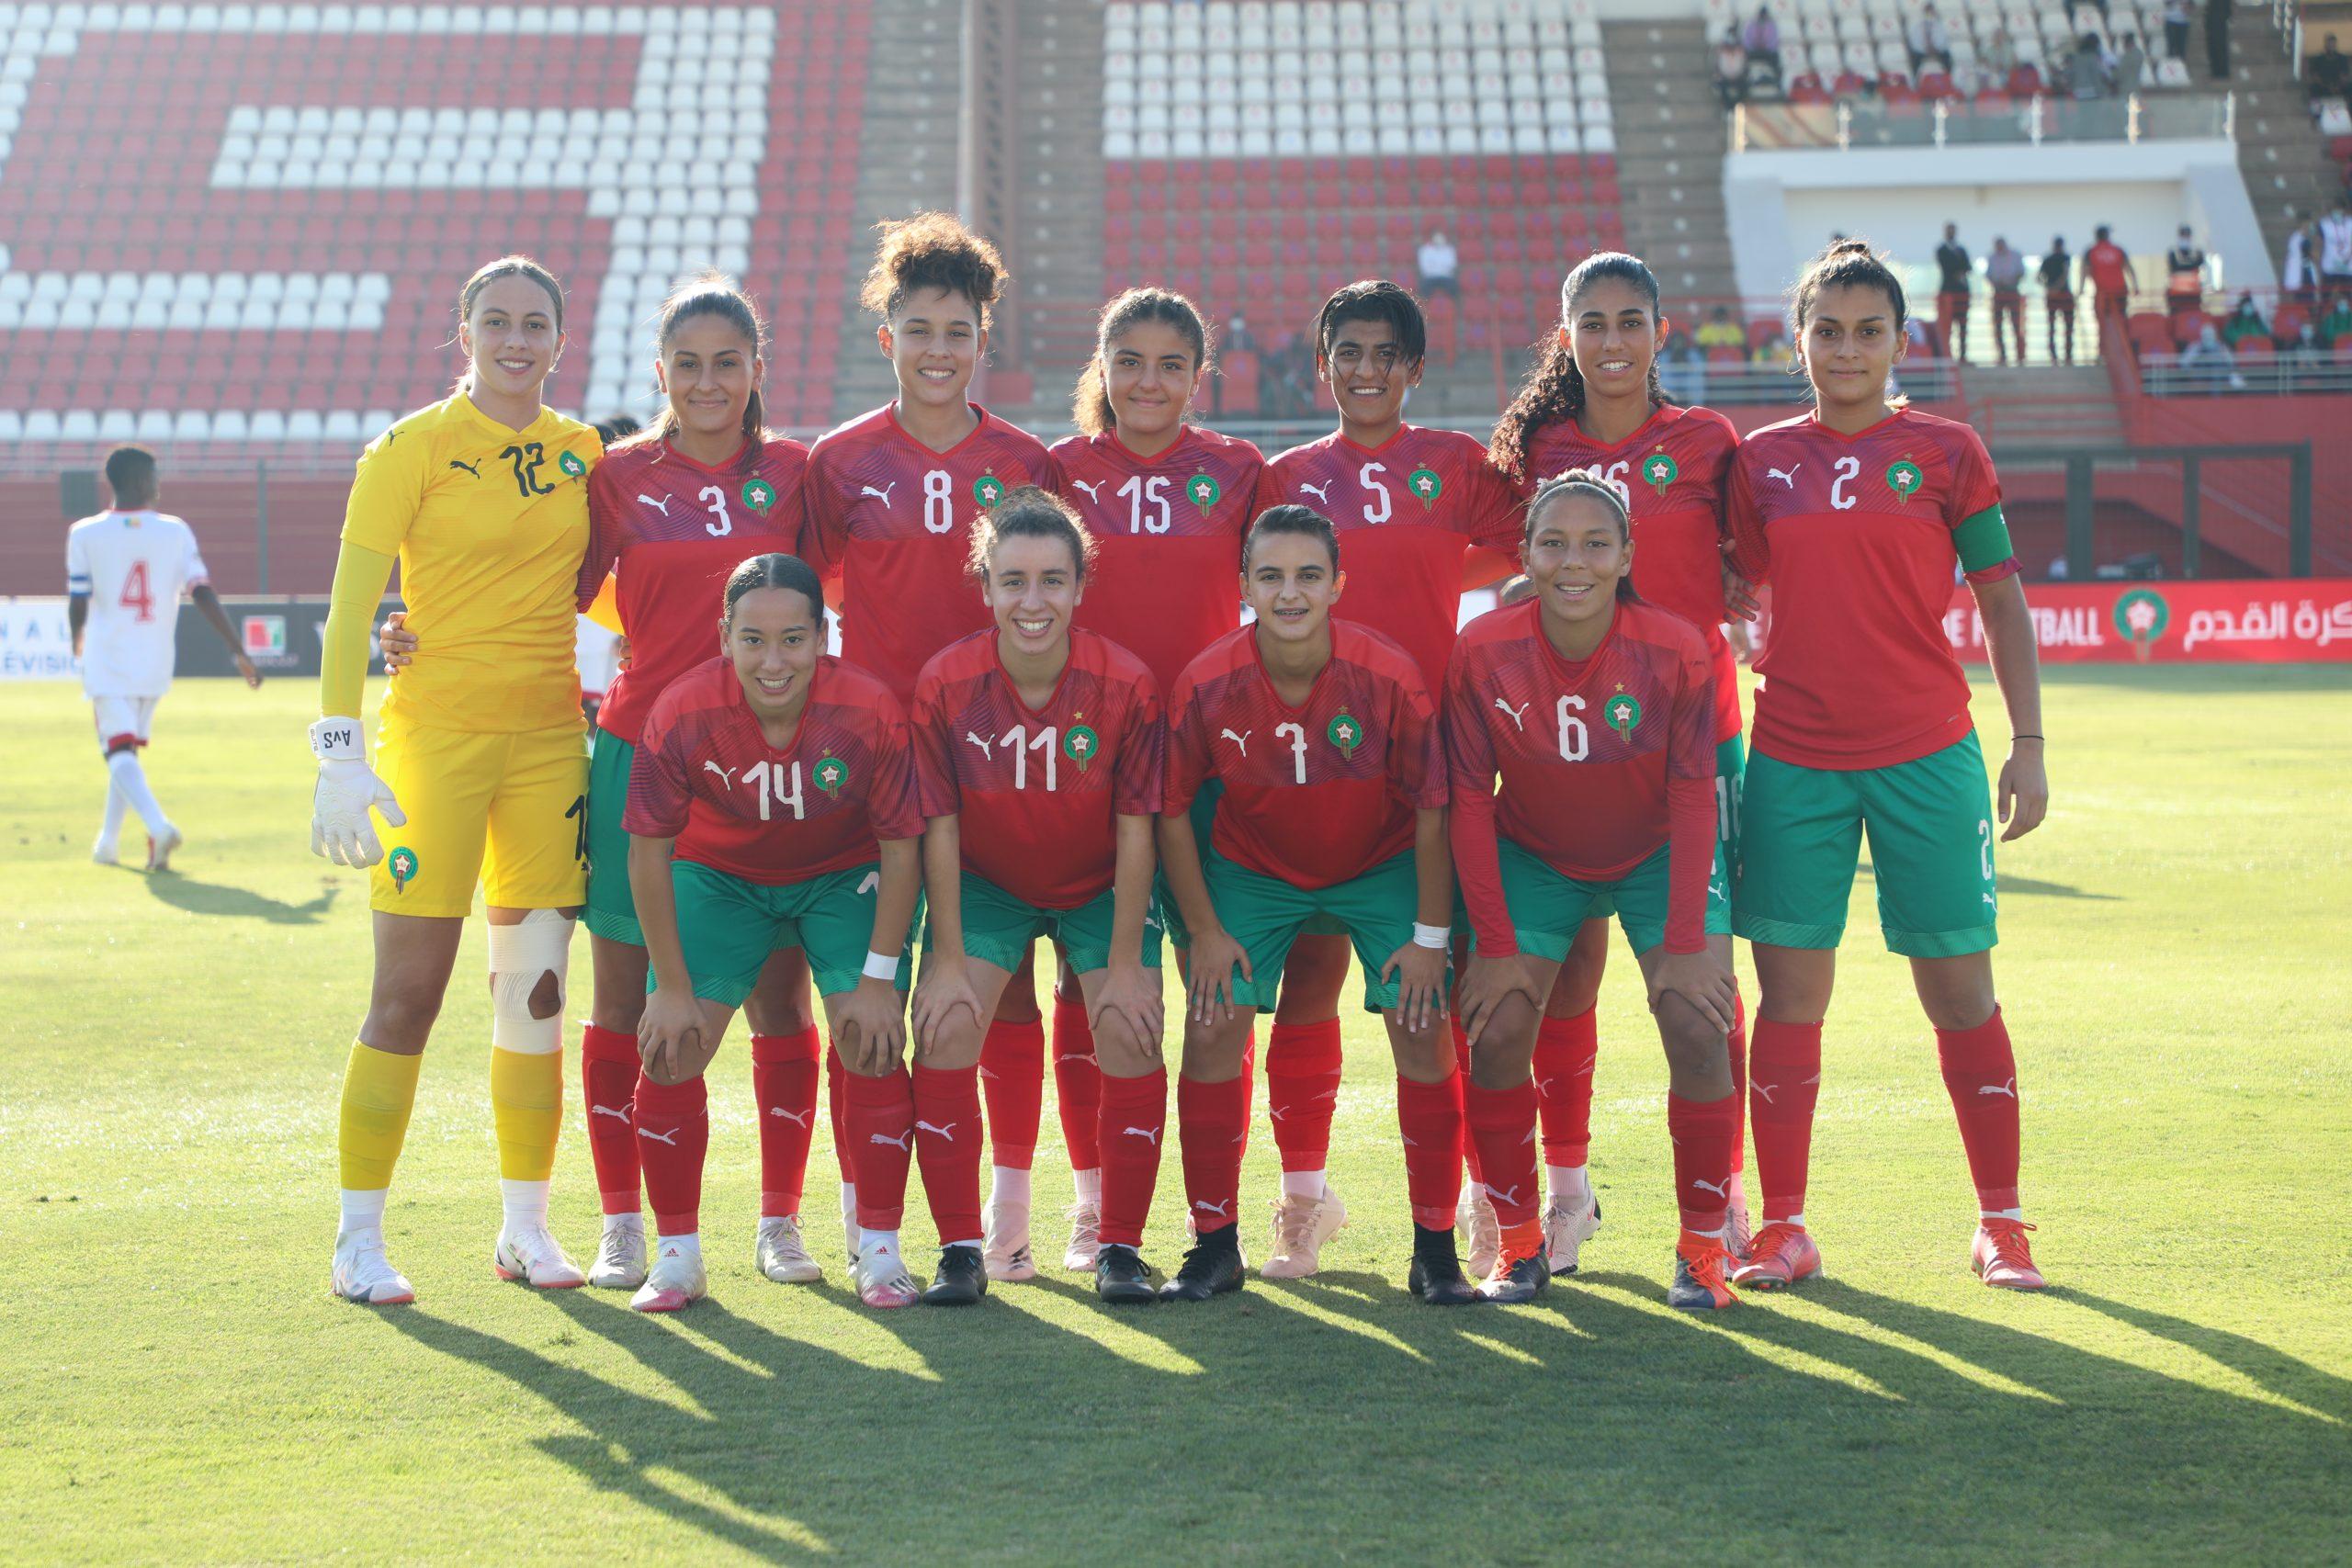 La sélection féminine U20 du Maroc.